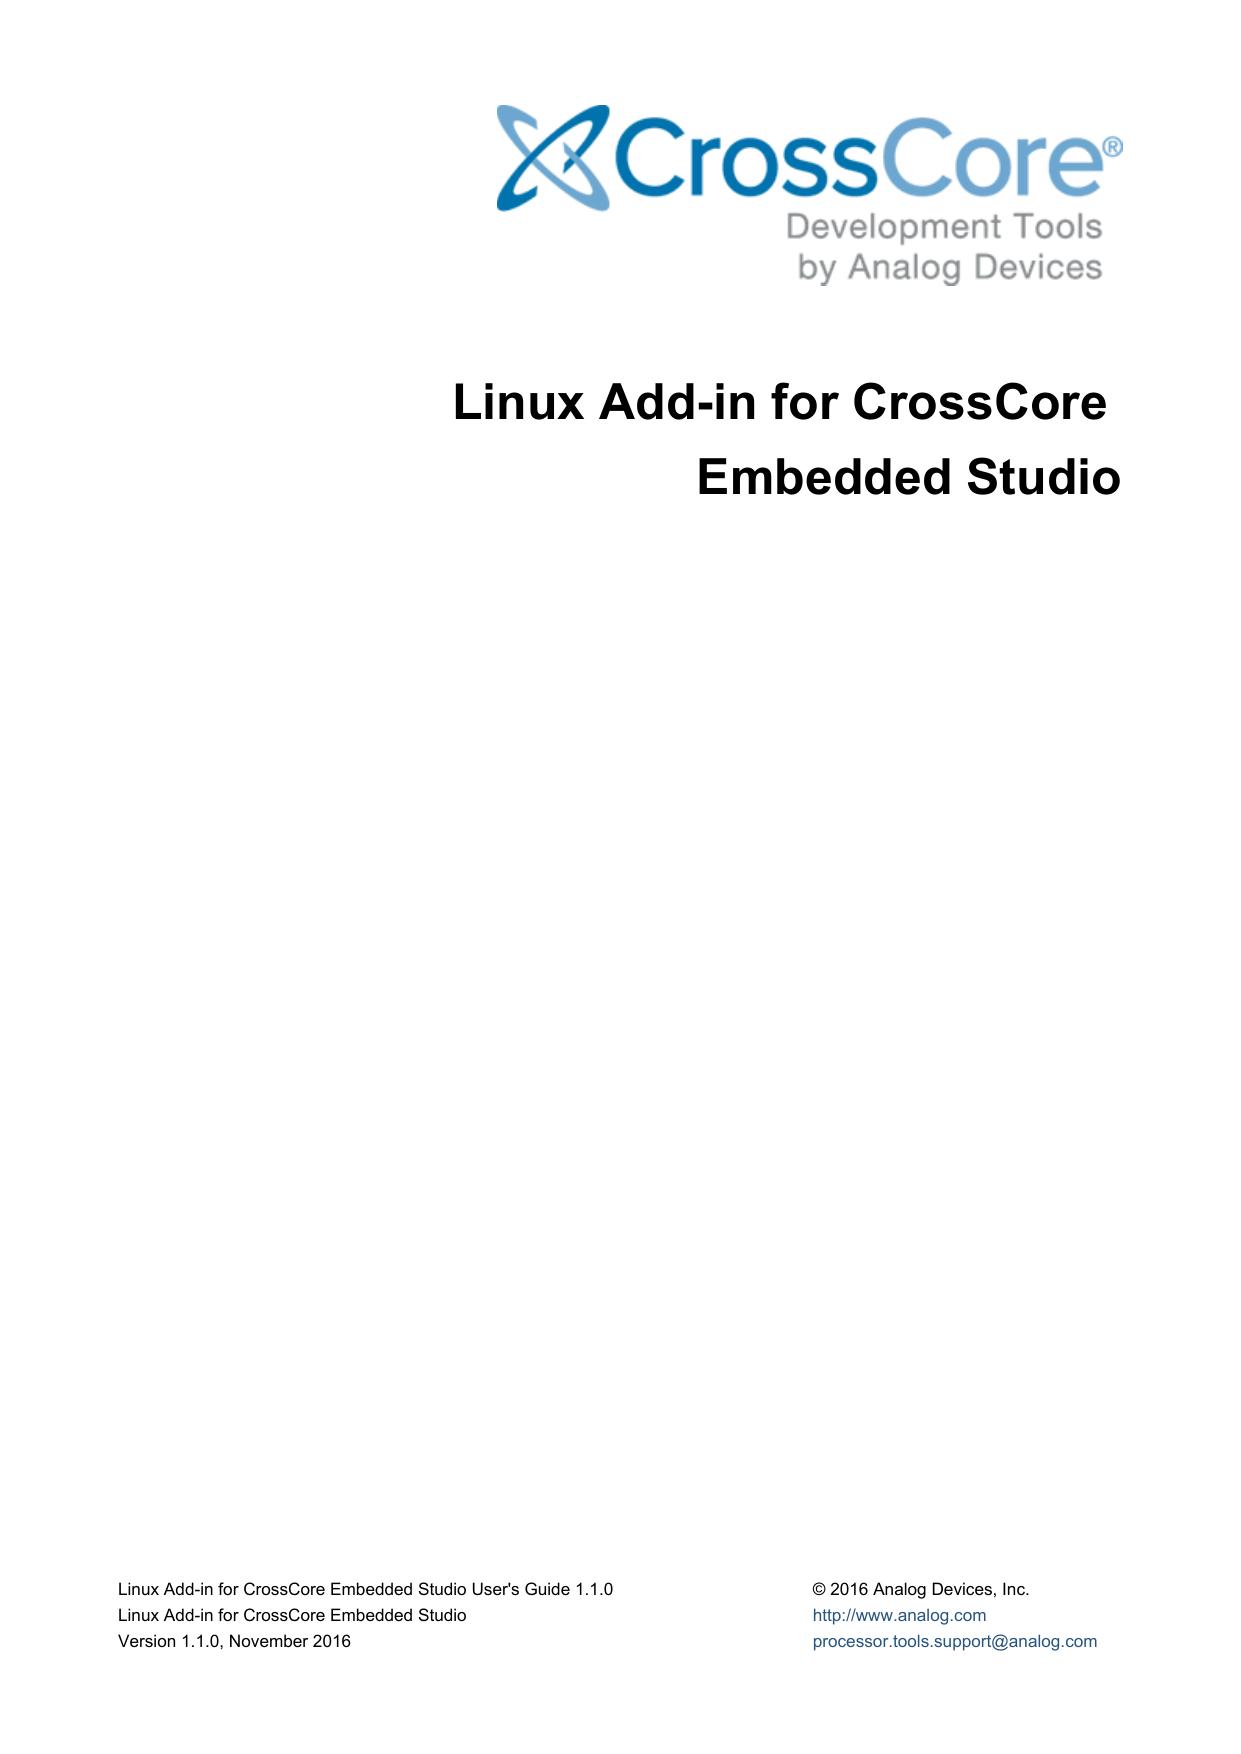 Linux Add-in for CrossCore Embedded Studio   manualzz com